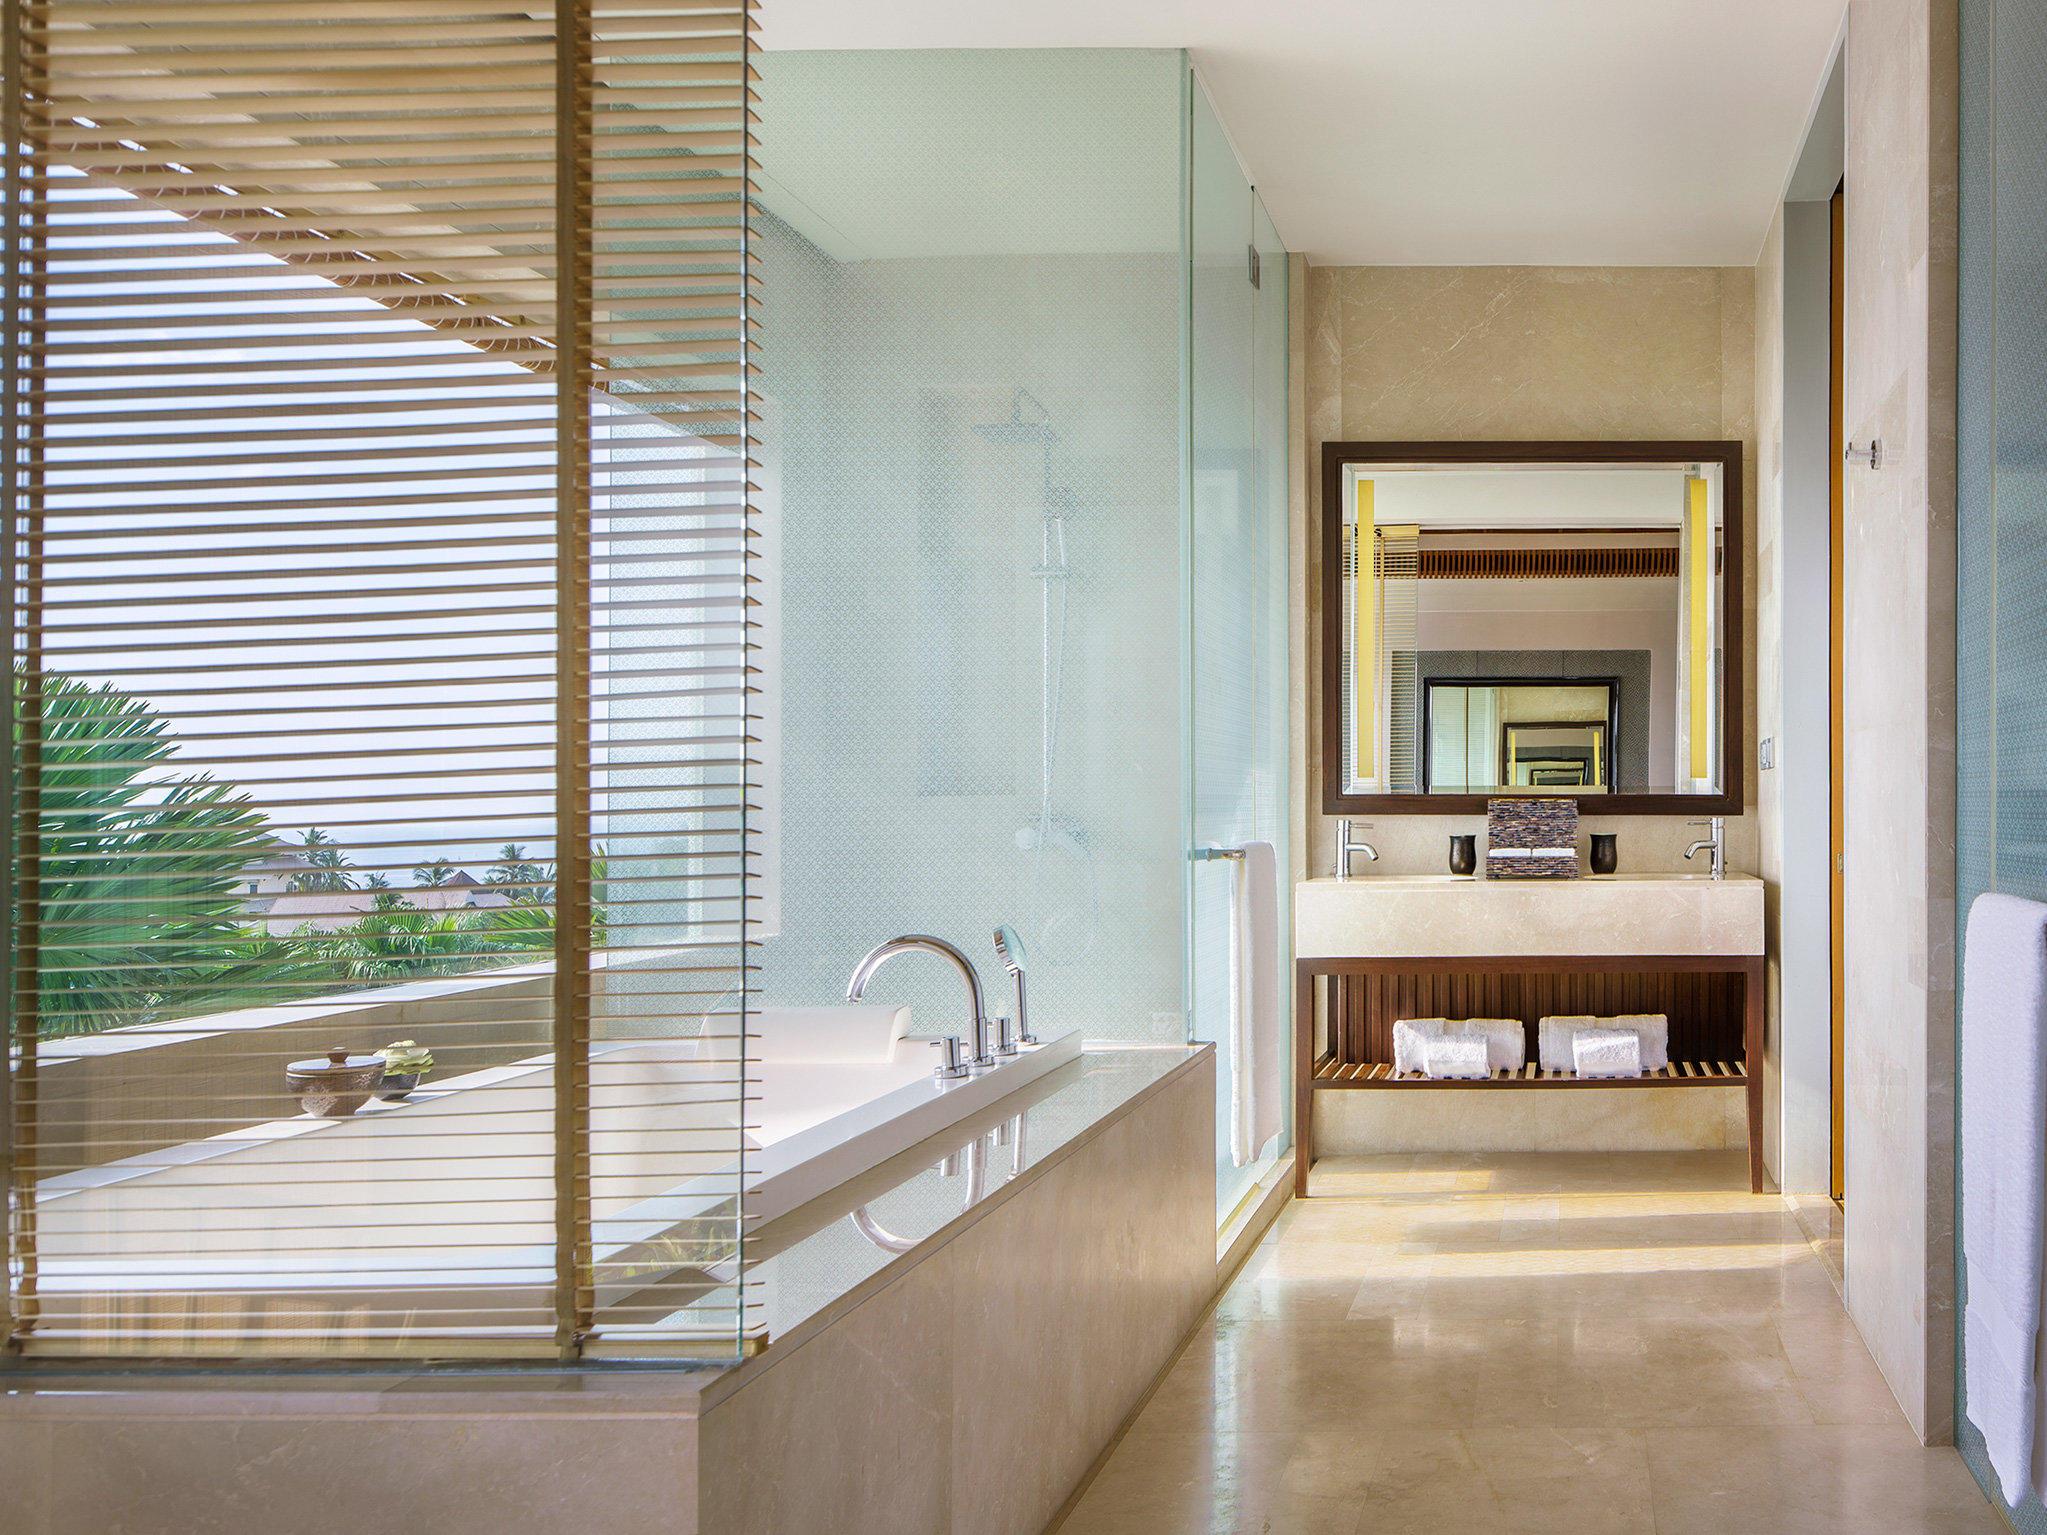 Amatara Wellness Resort - Sea View Suite bathtub